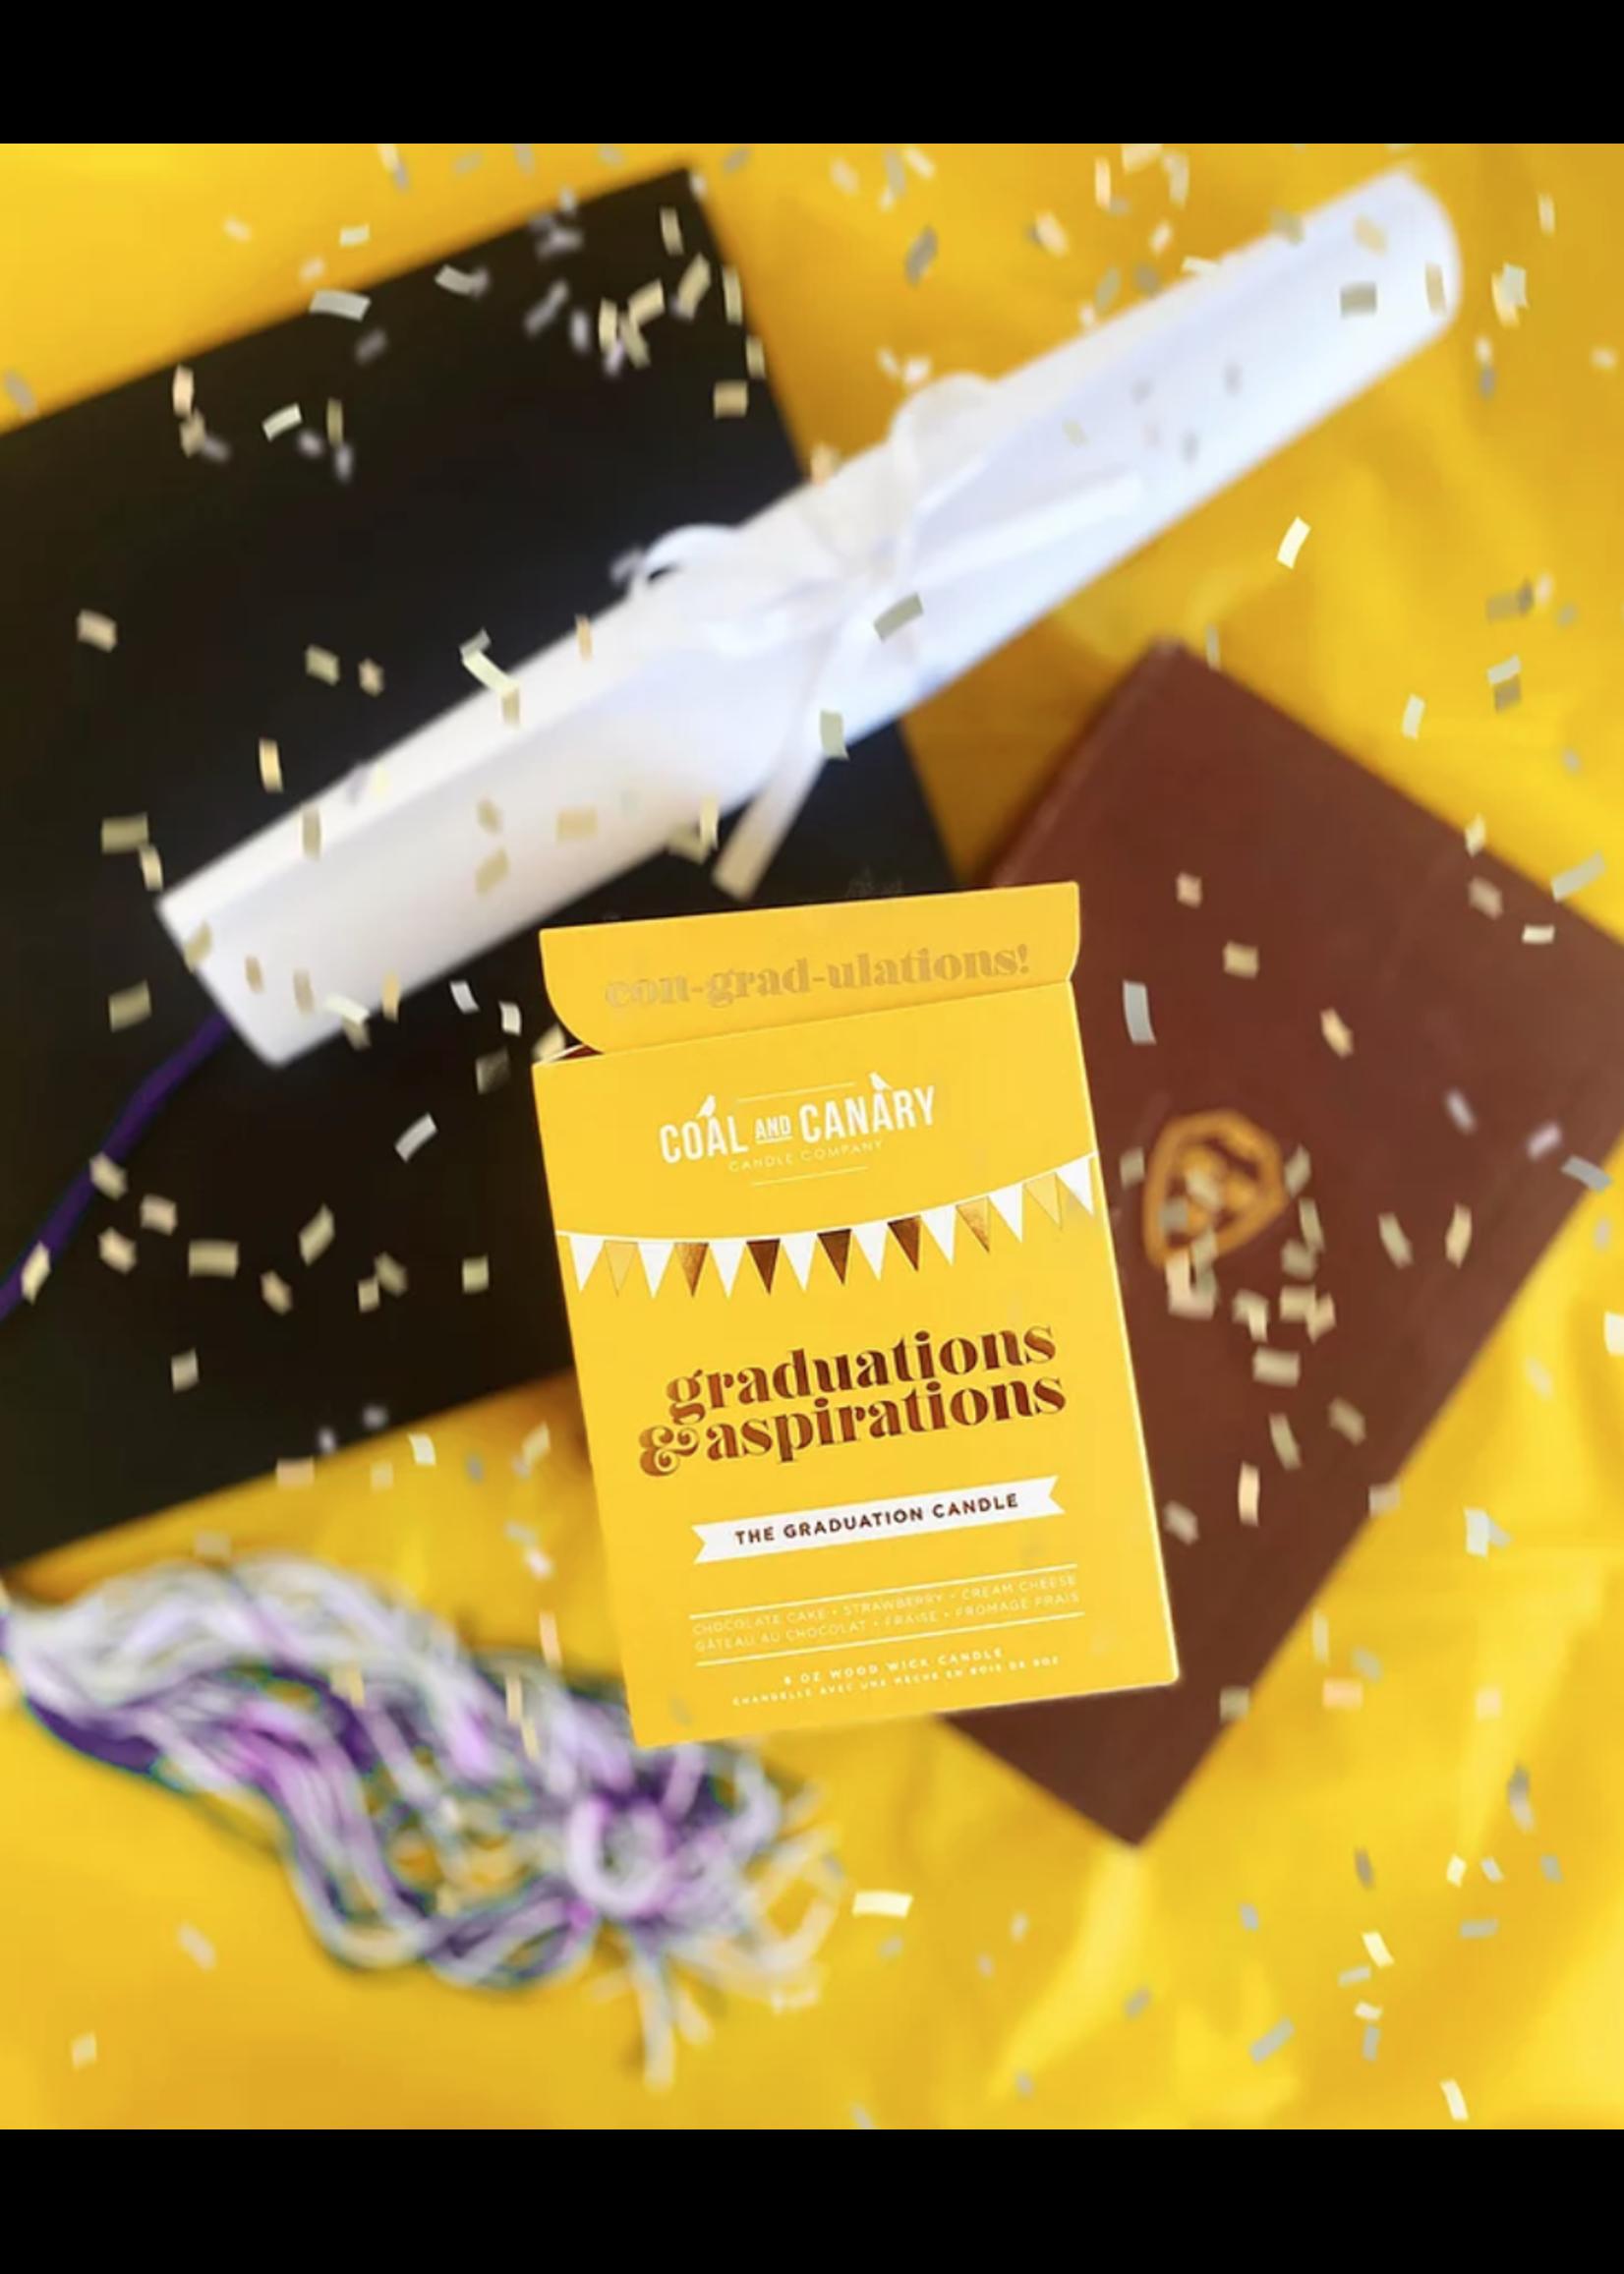 Coal and Canary Graduations & Aspirations